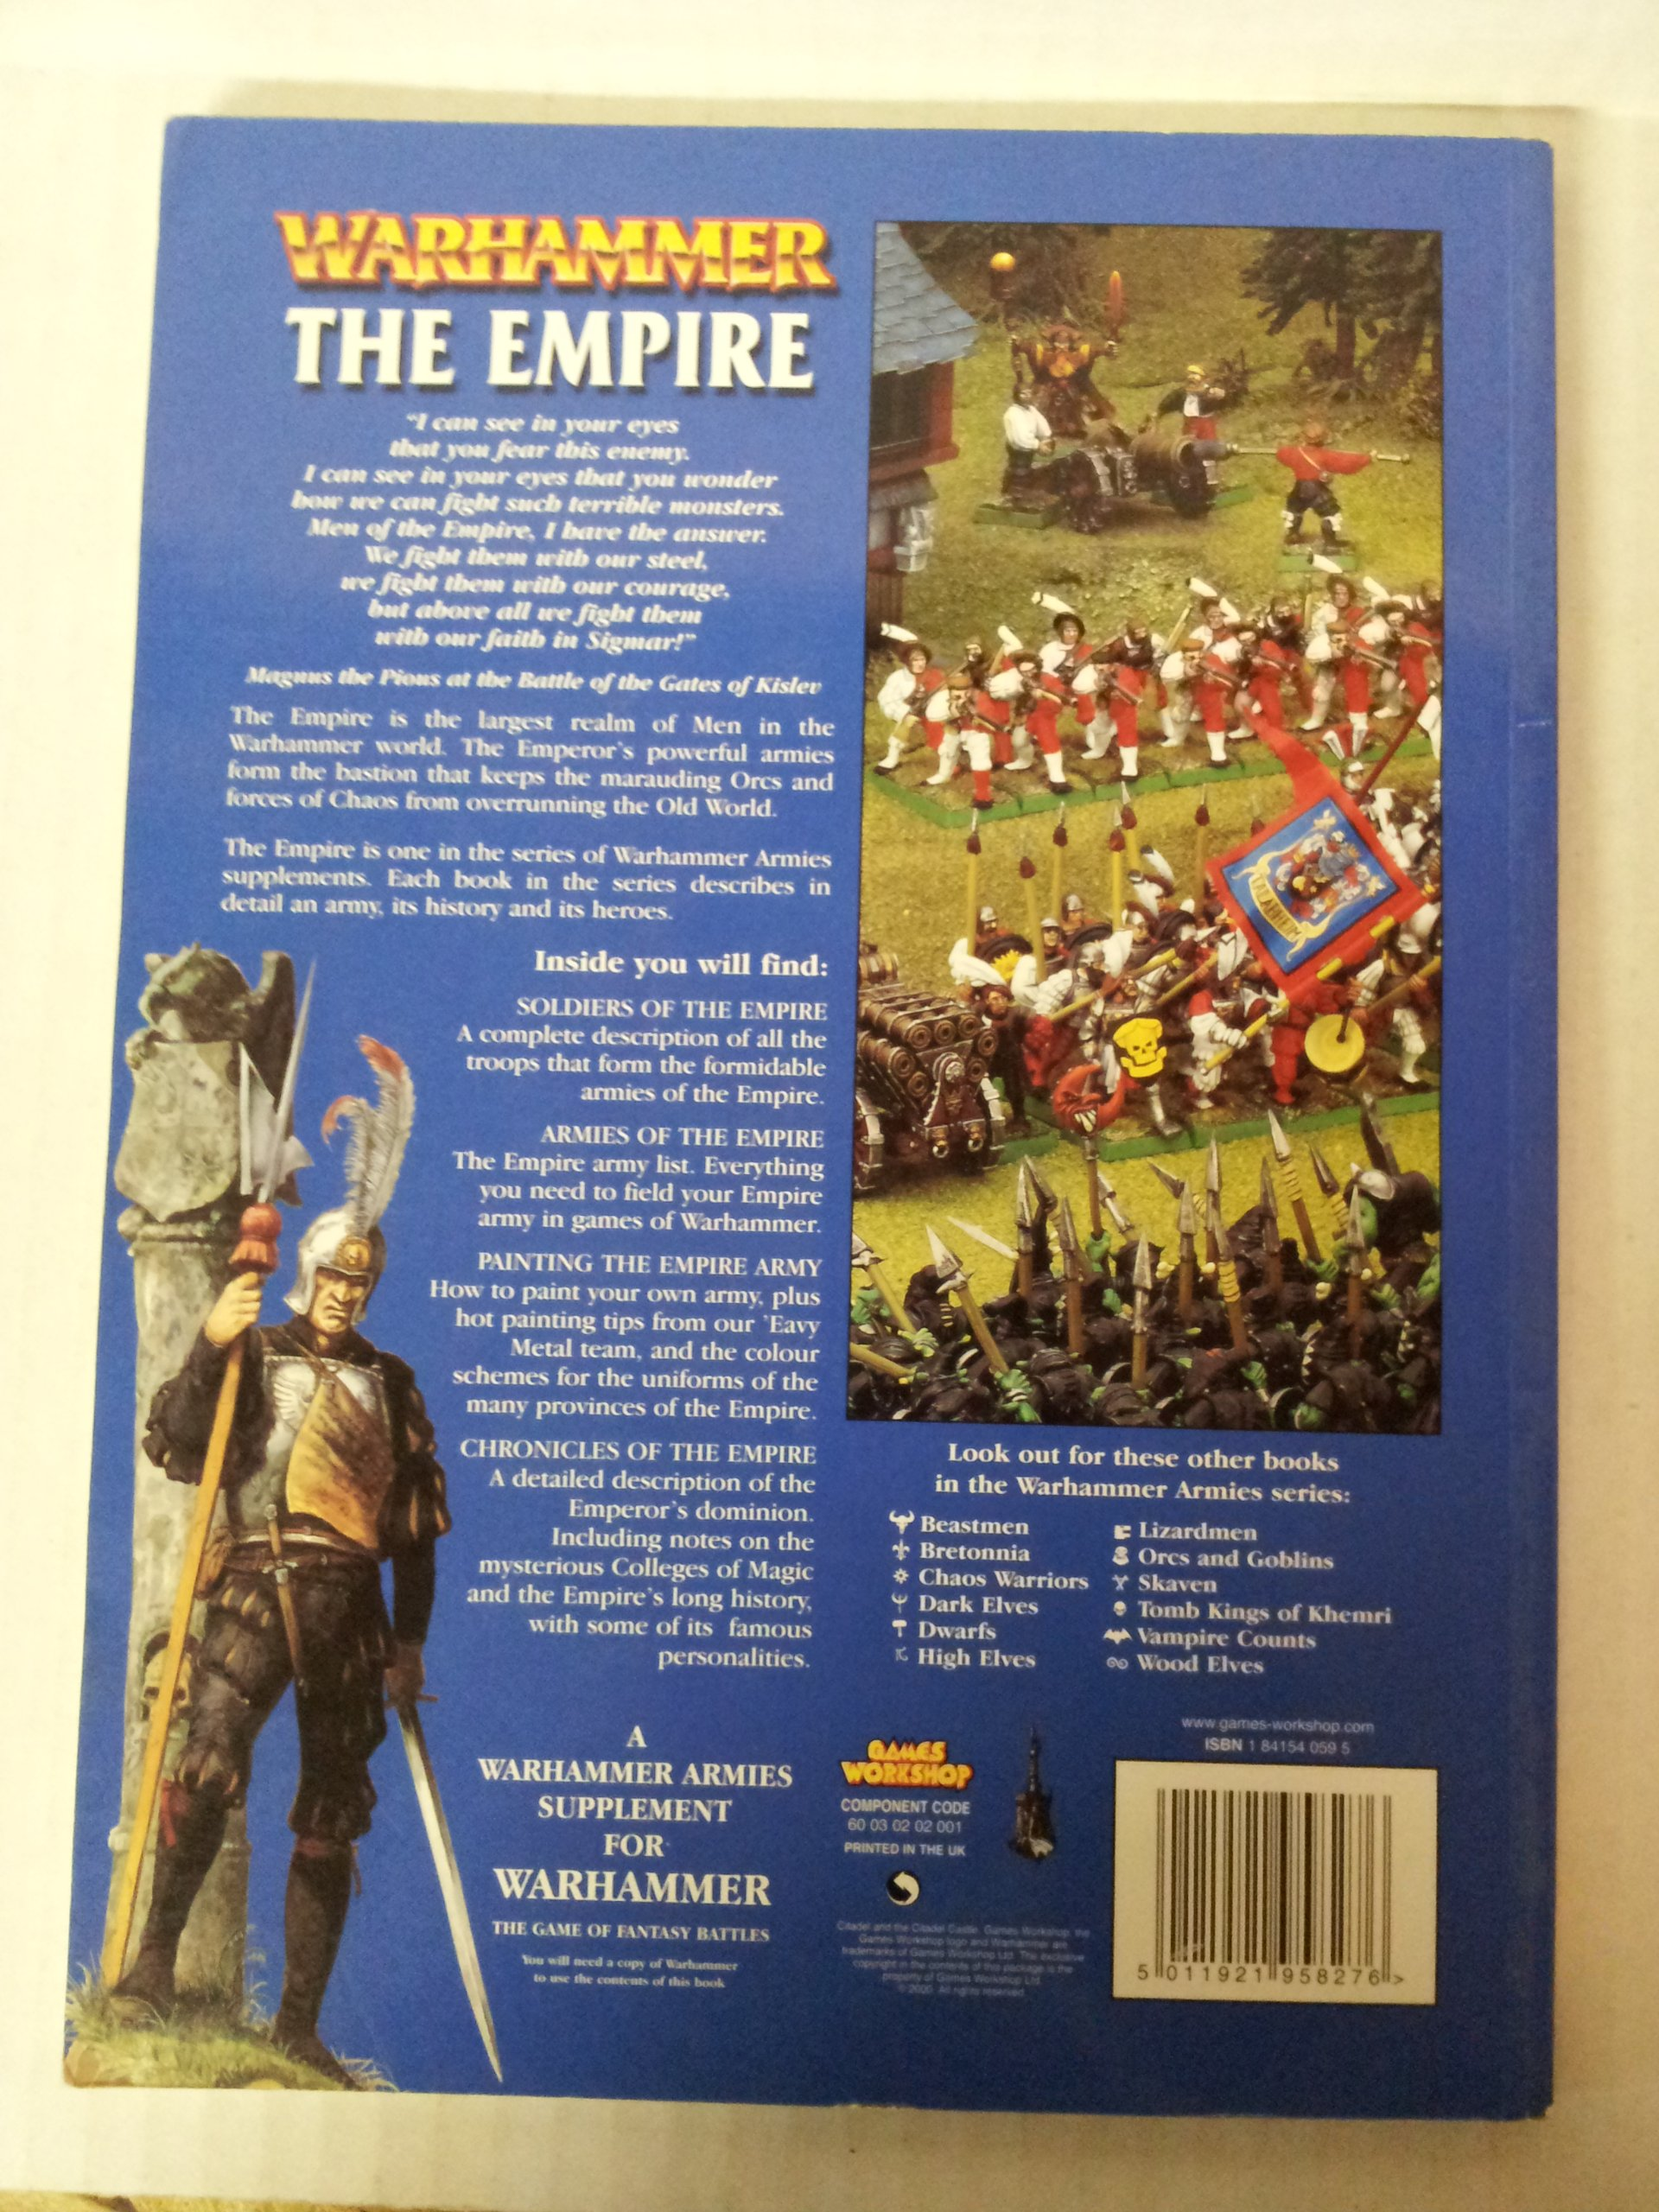 Amazon: Warhammer Armies: The Empire (9781841540597): Alessio Cavetore,  Dylan Owen, Alexander Boyd, Paul Dainton, Karl Kopinski, David Gallagher,